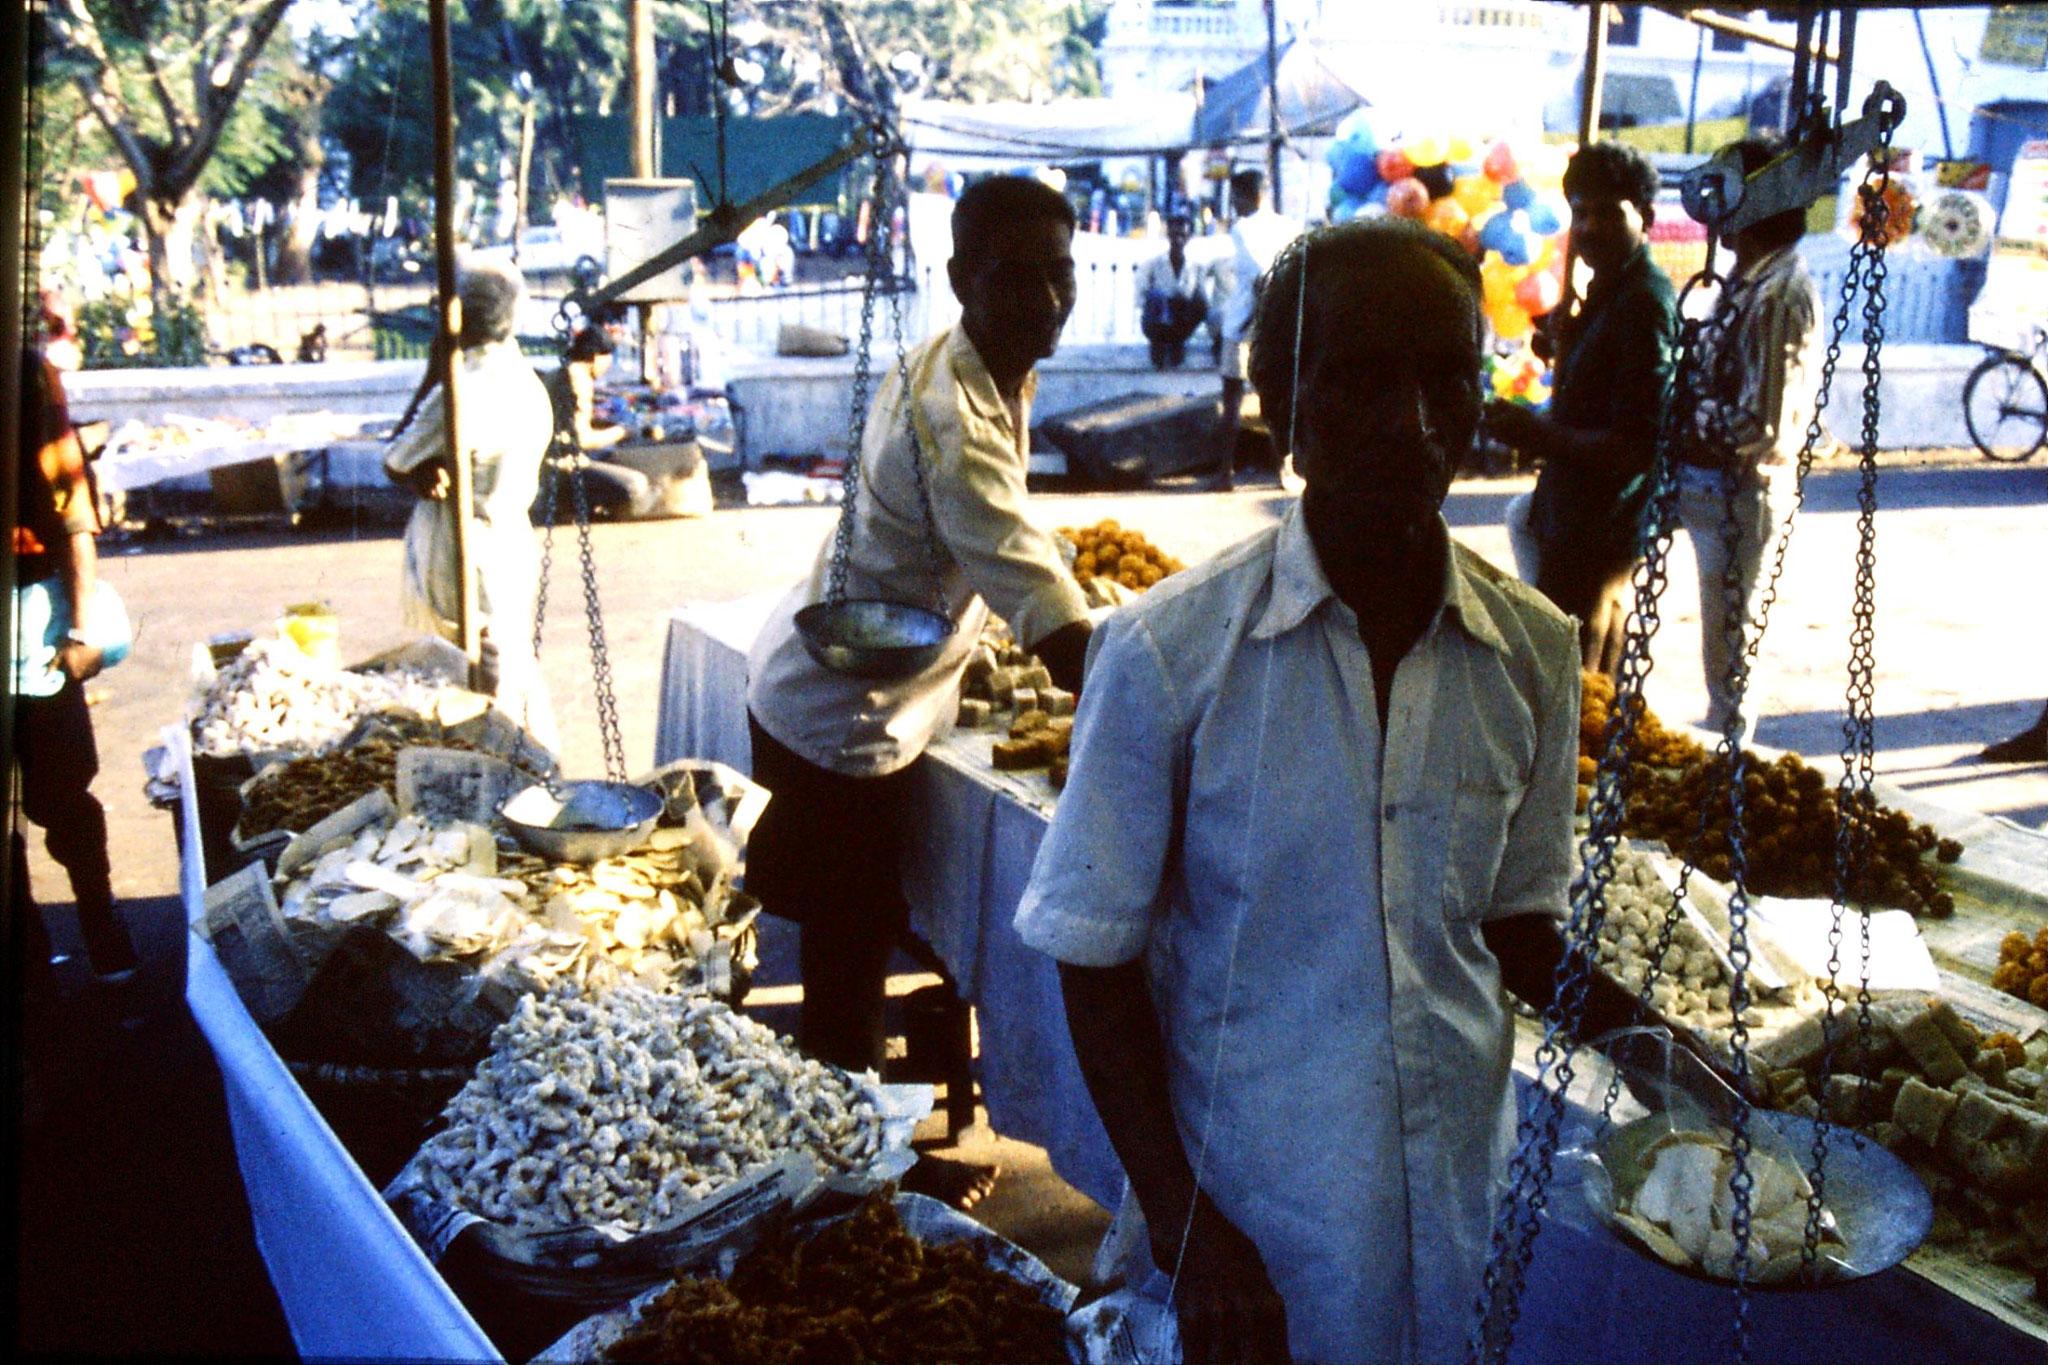 31/12/1989: 6:Goa Siolim church and market on festival day